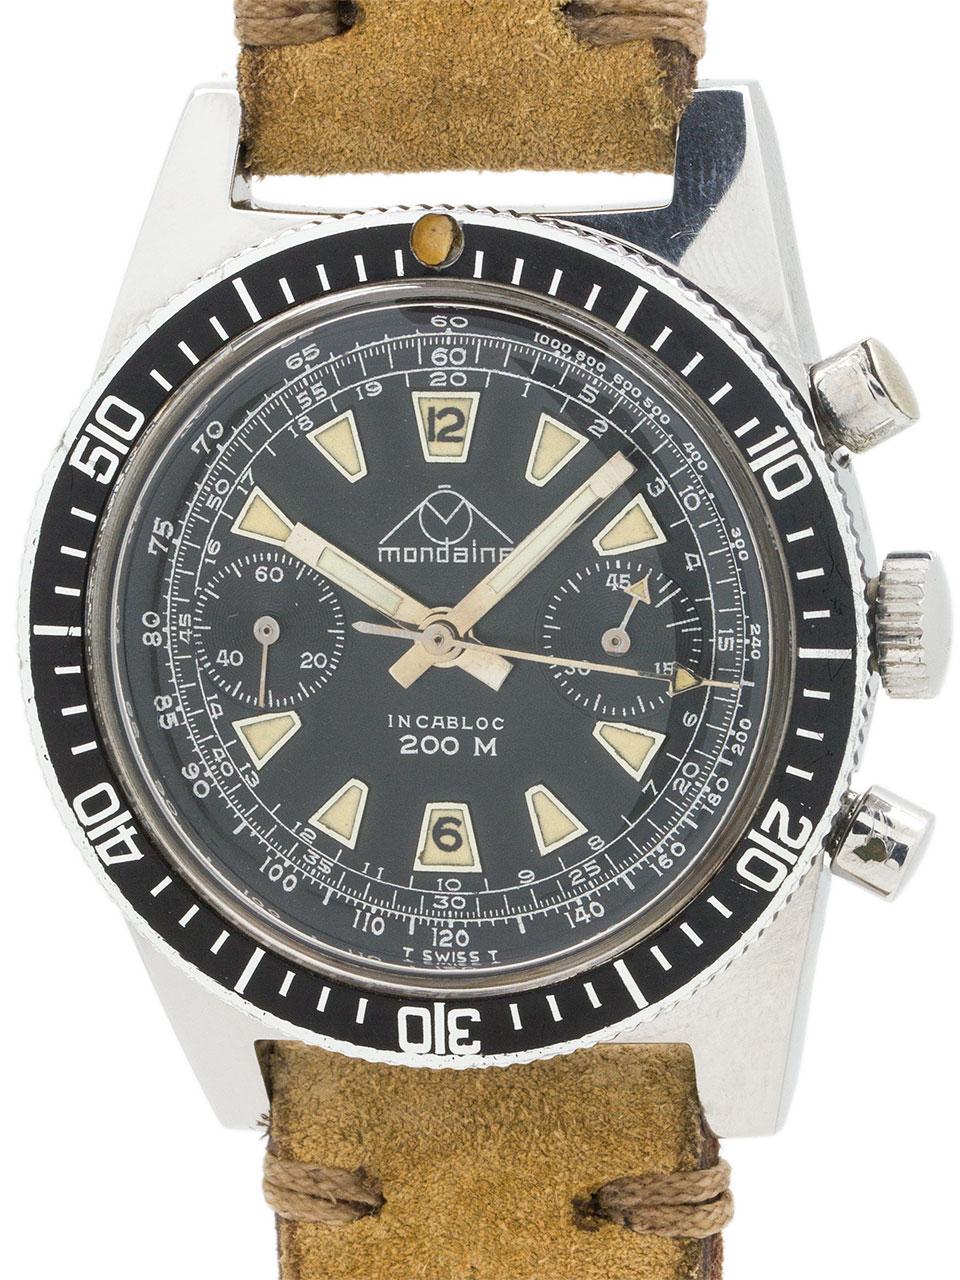 Mondaine Swiss Chronograph circa 1960's